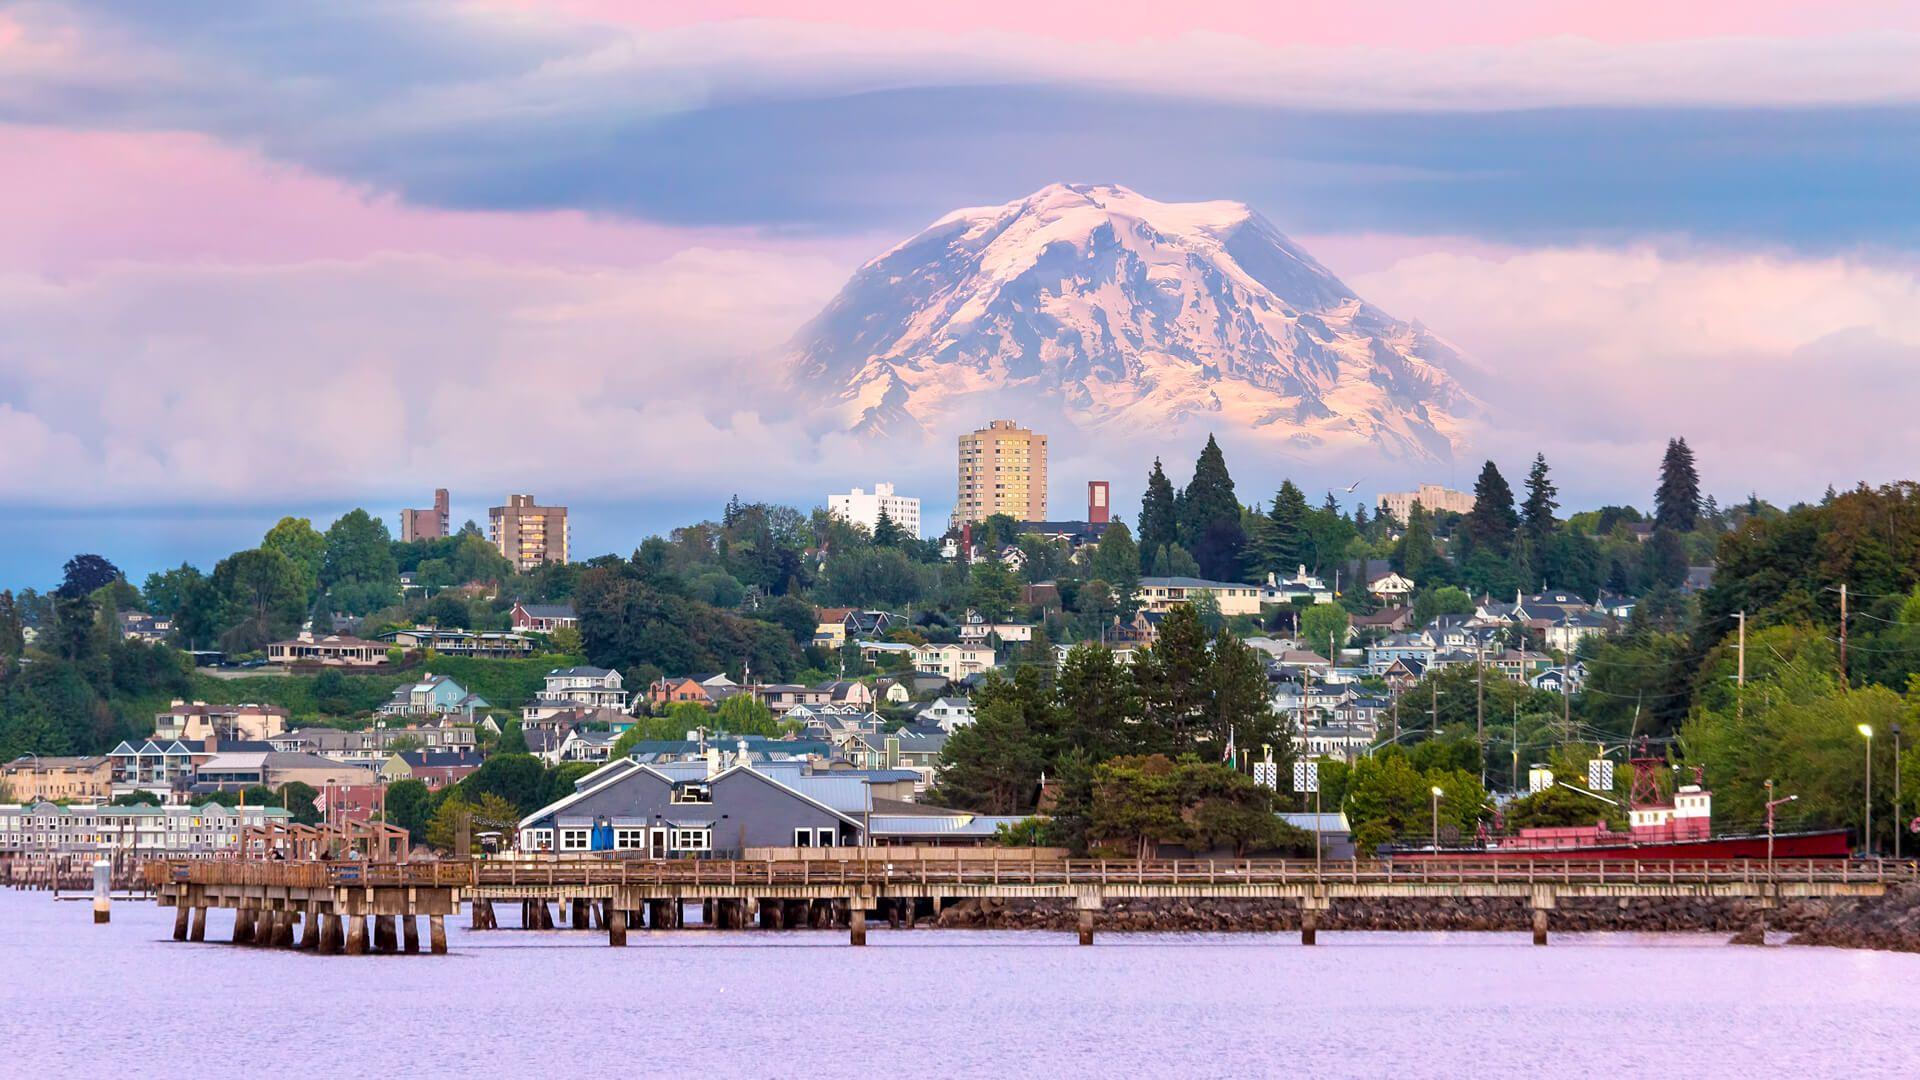 Mount Rainier over Tacoma Washington waterfront during alpenglow sunset evening.